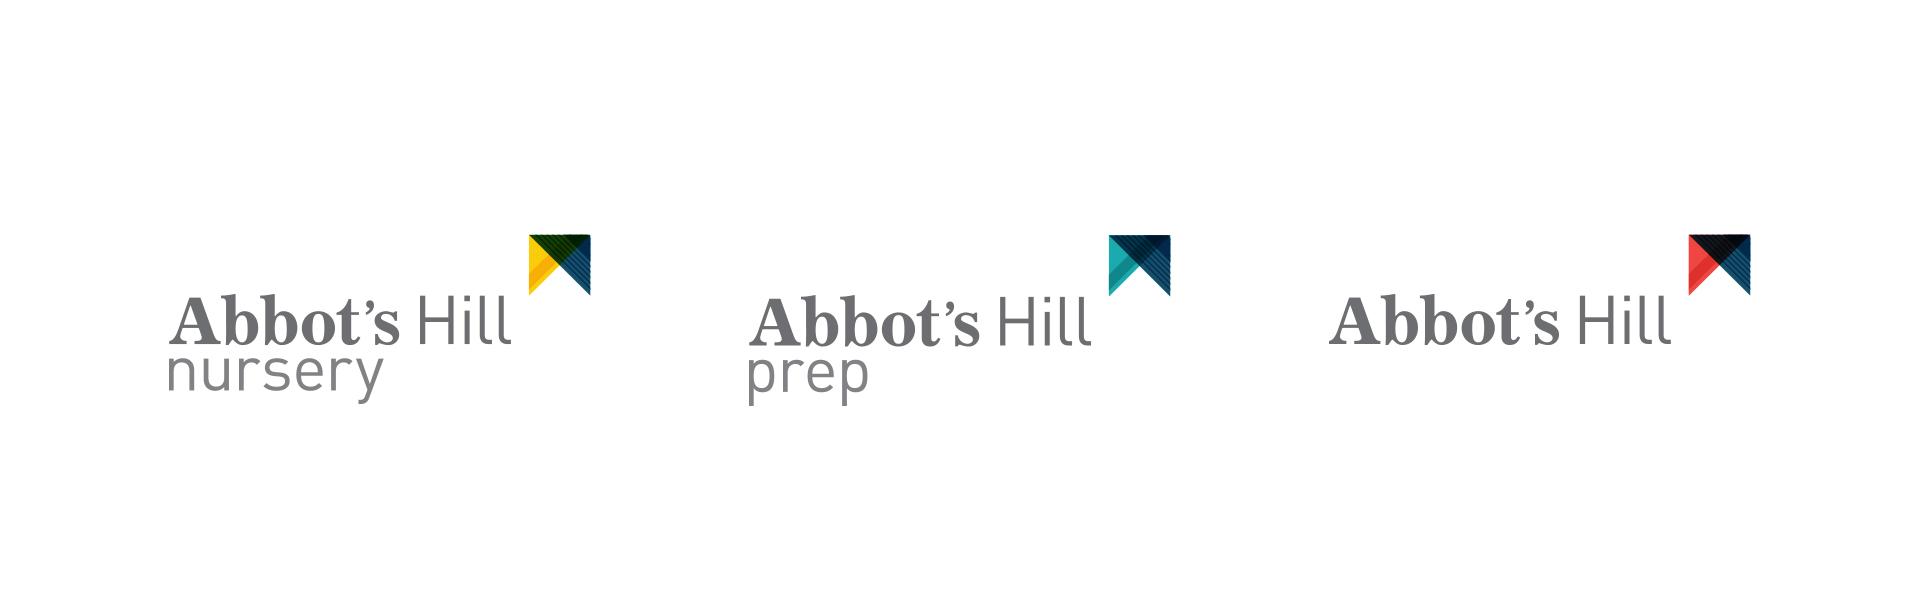 Abbots Hill School brand logos